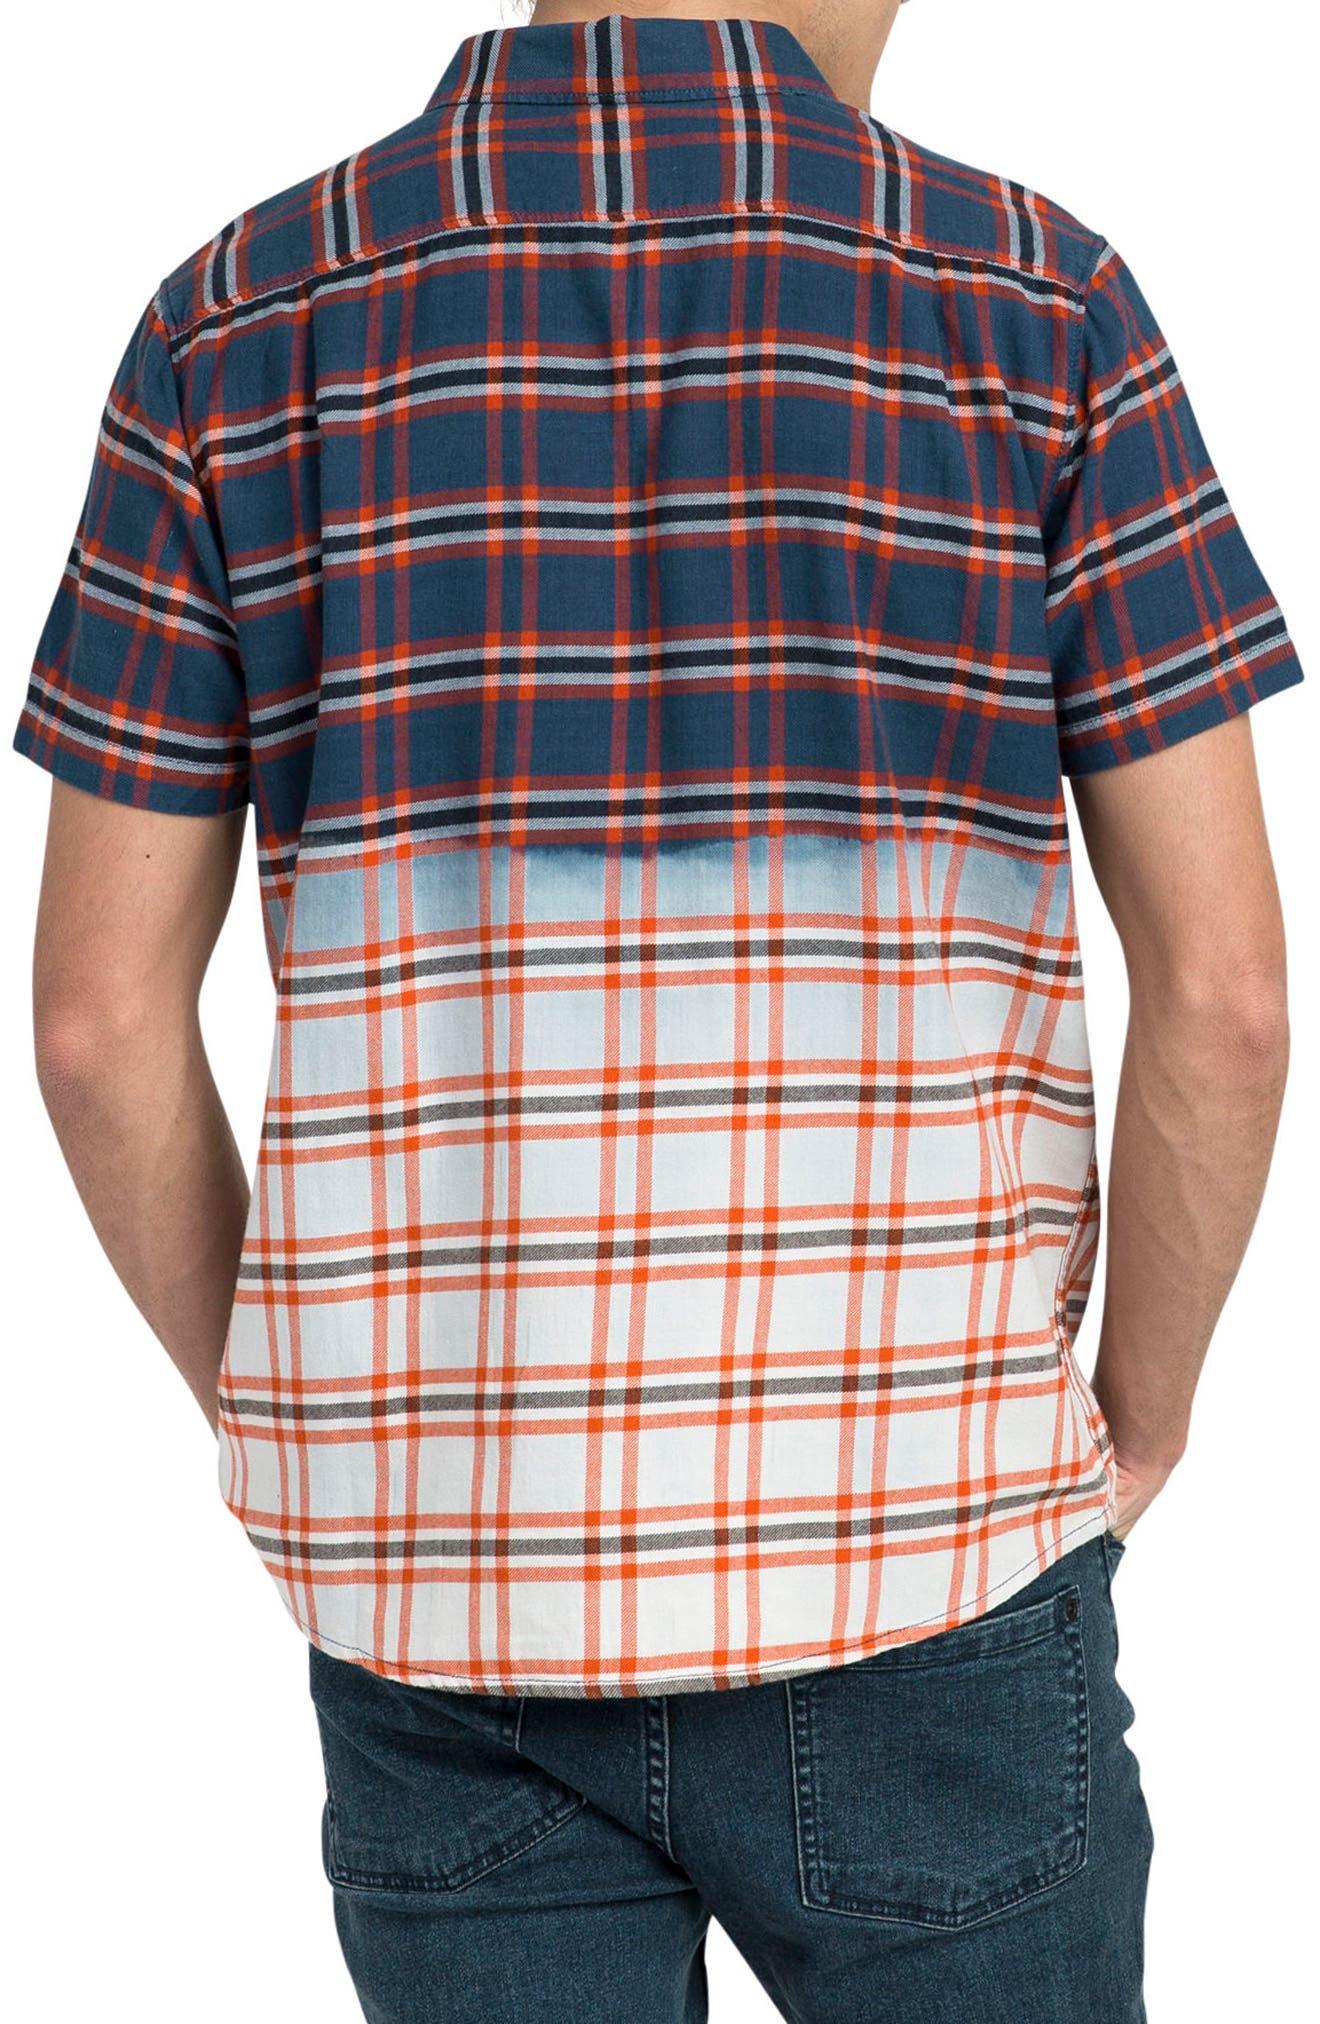 Prismatic Check Woven Shirt,                             Alternate thumbnail 2, color,                             458